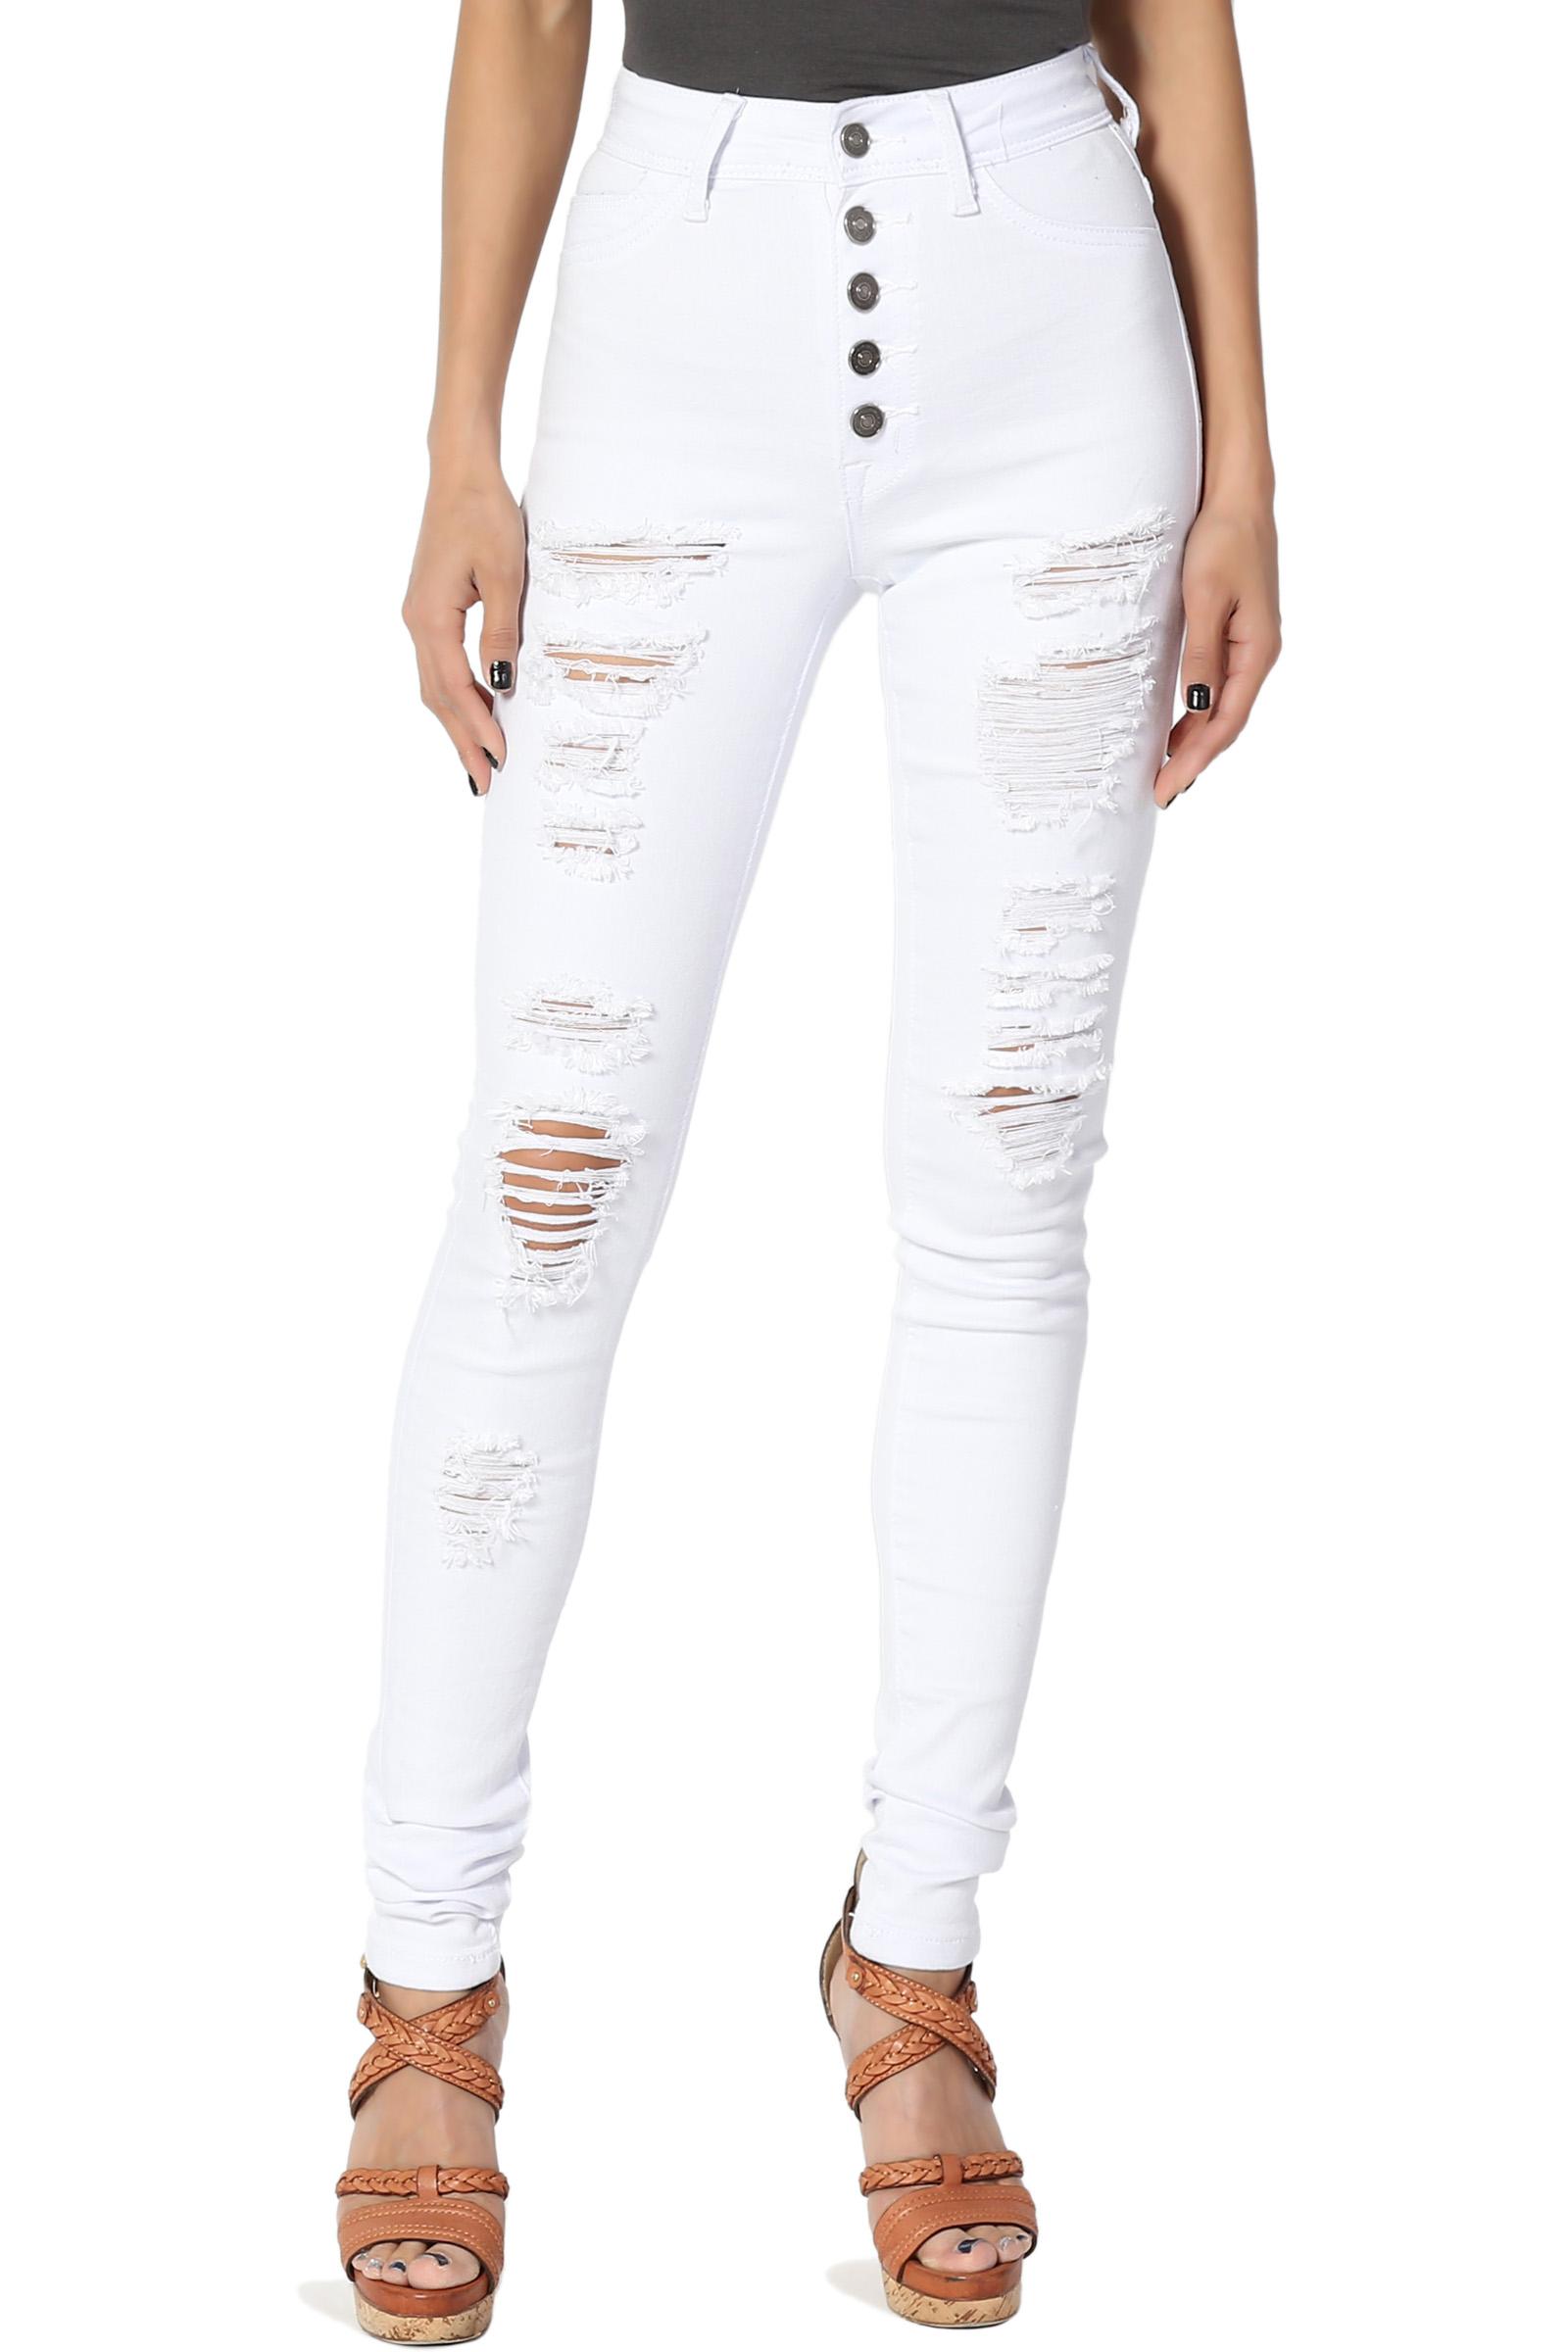 TheMogan Women's Distressed Button Up High Waist Stretch Soft Denim Skinny Jeans